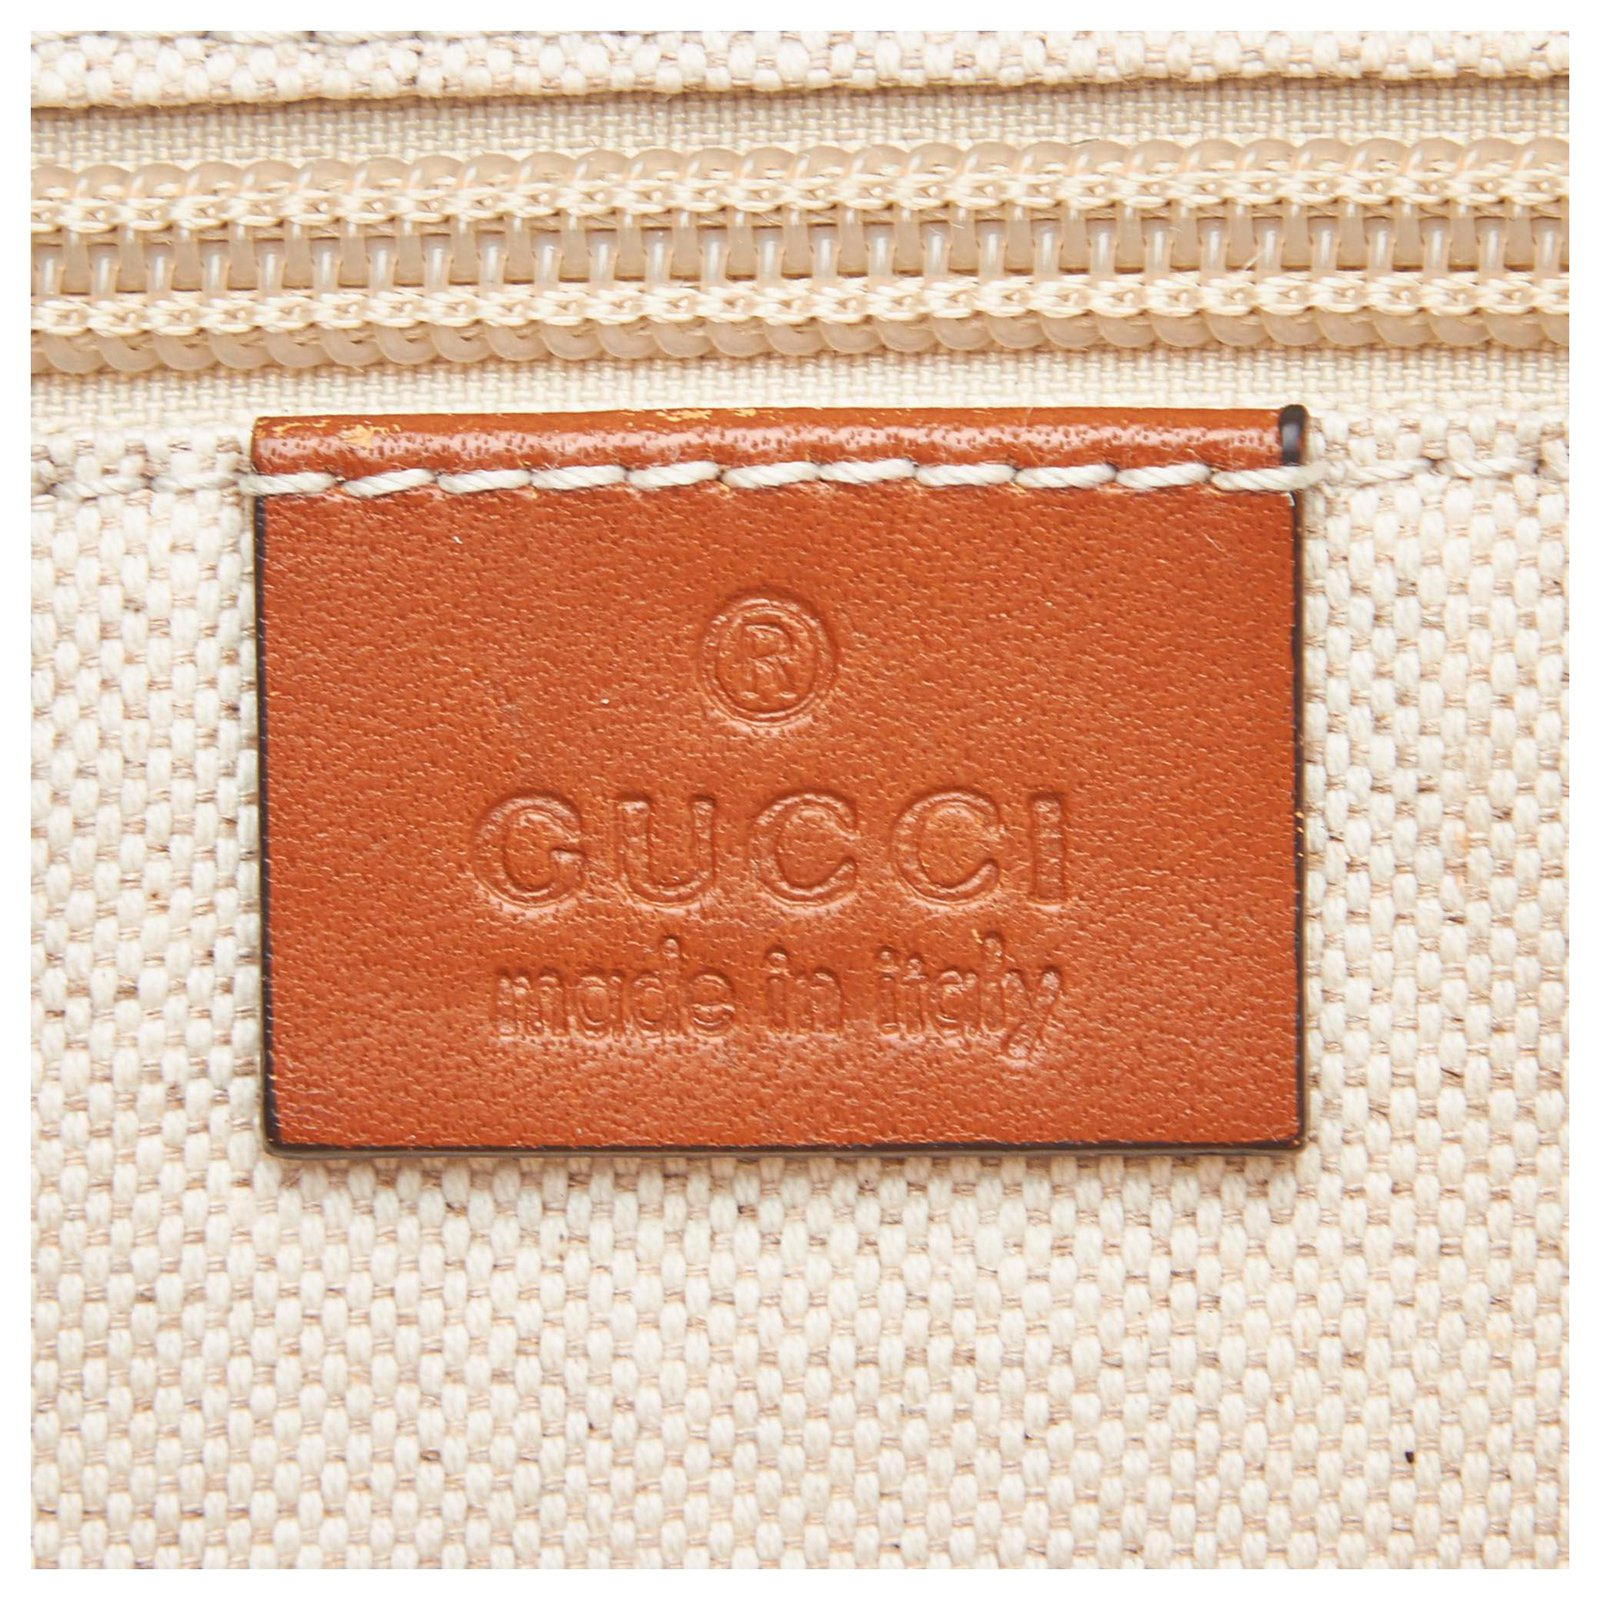 1fb1bcea1e54e6 Gucci Gucci Brown Web Straw Tote Bag Totes Leather,Other,Straw Brown,Multiple  colors,Beige ref.125285 - Joli Closet